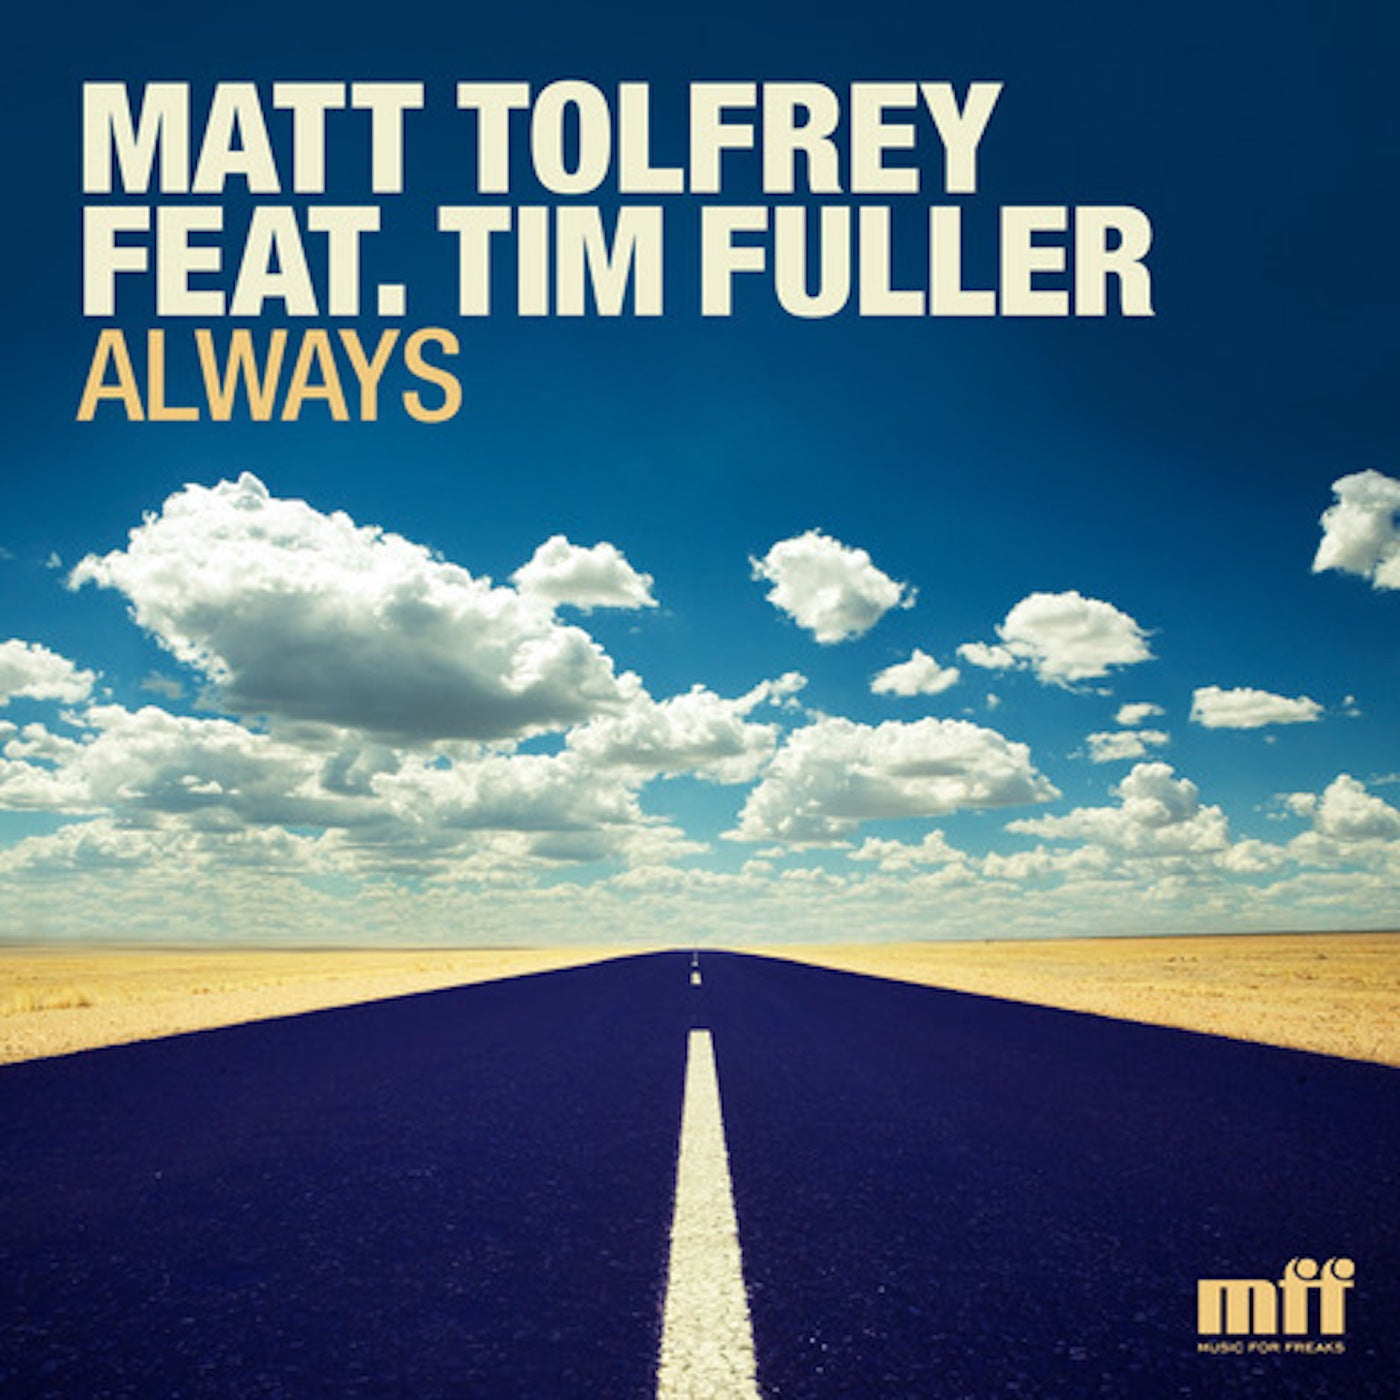 Always (Mark Farina's Bass Edit Raw Dub)